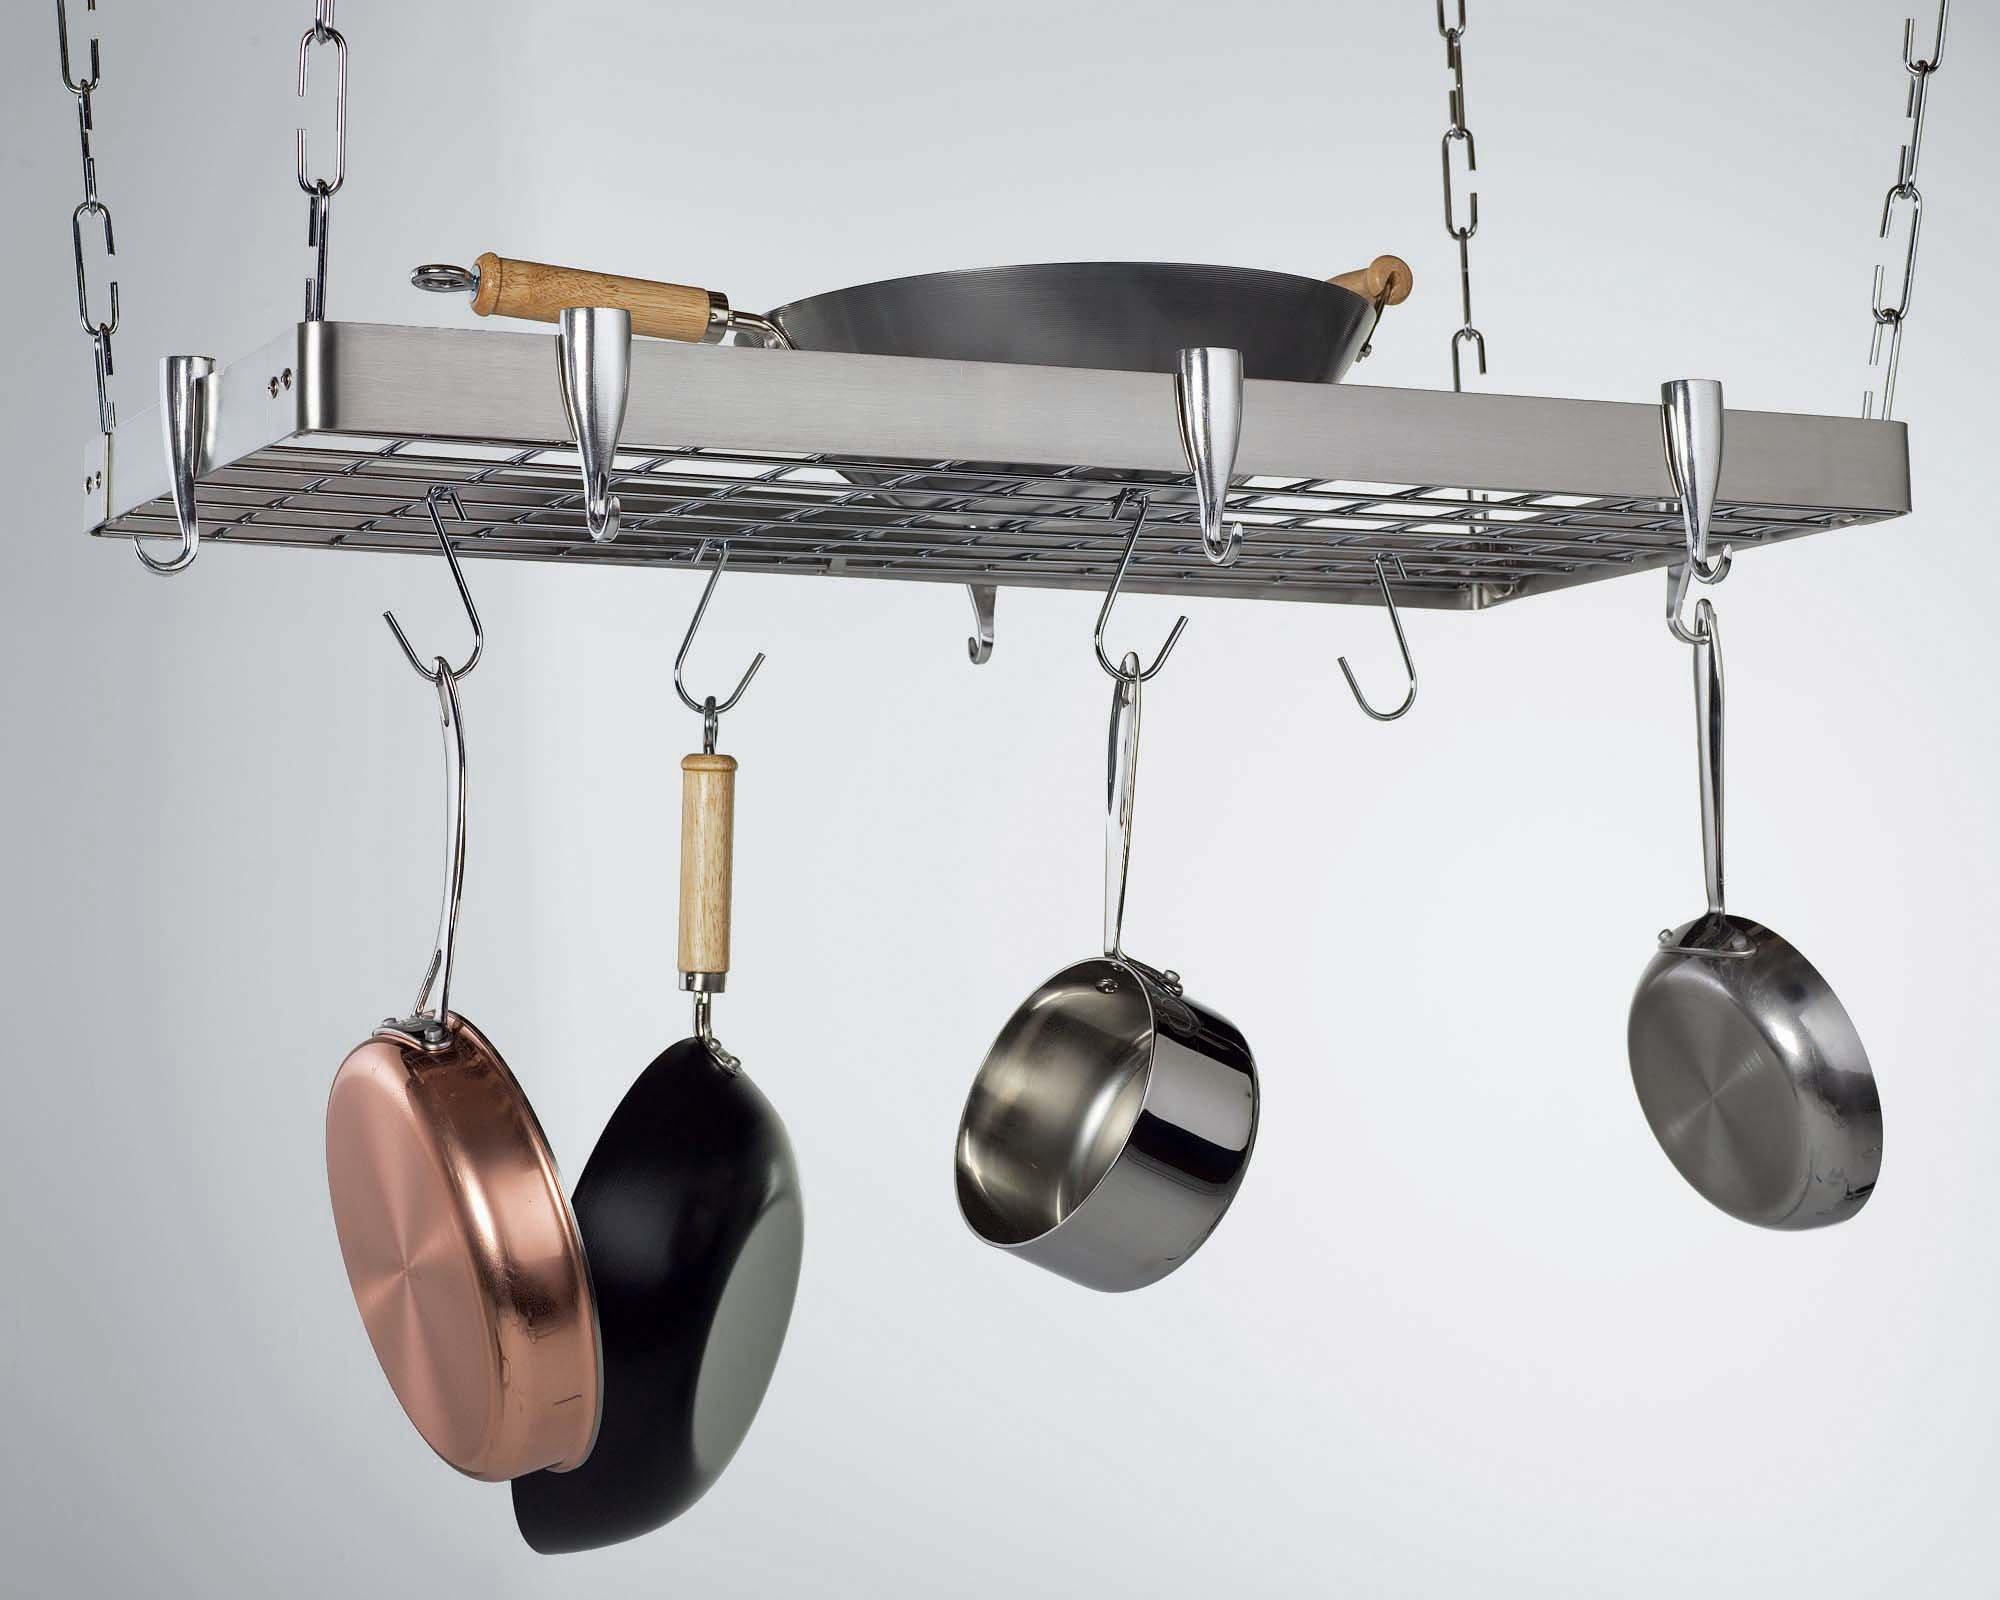 Concept Housewares Pr 40905 Stainless Steel Hanging Pot